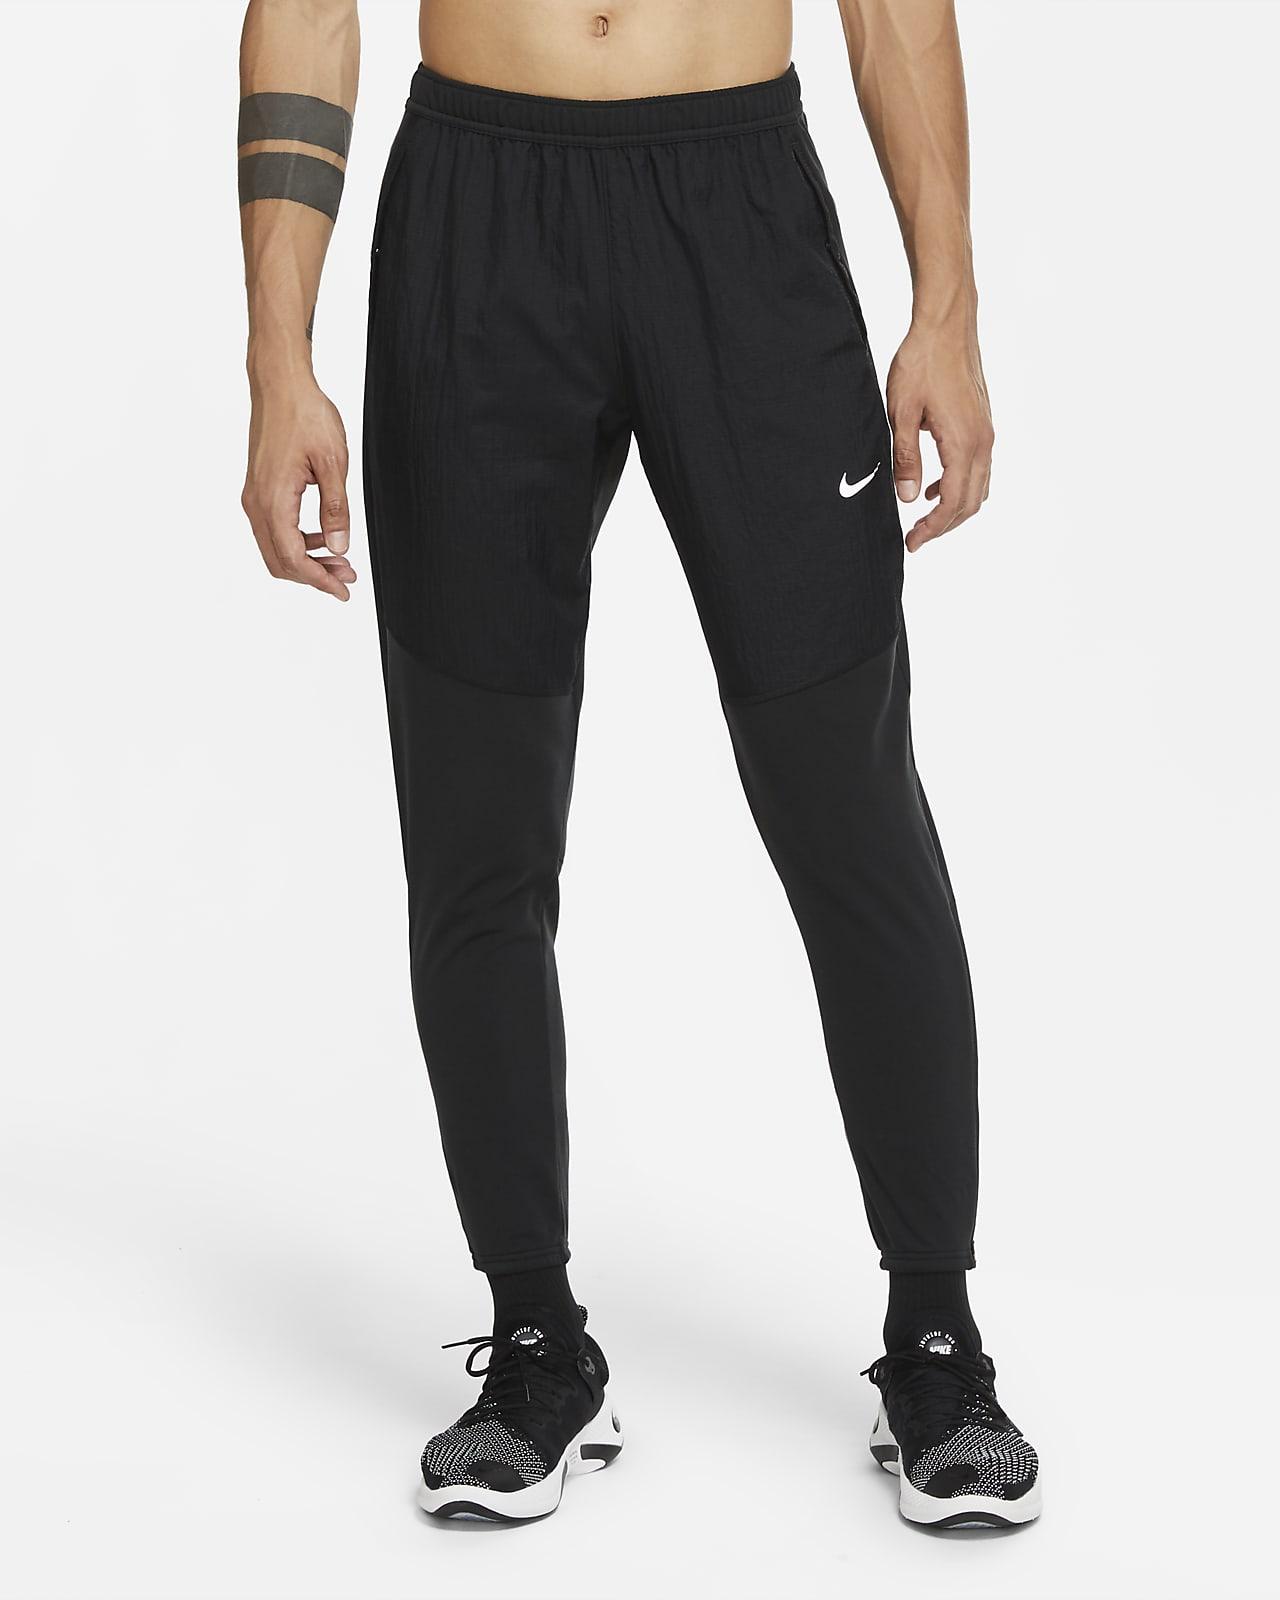 Pánské běžecké kalhoty Nike Therma Essential